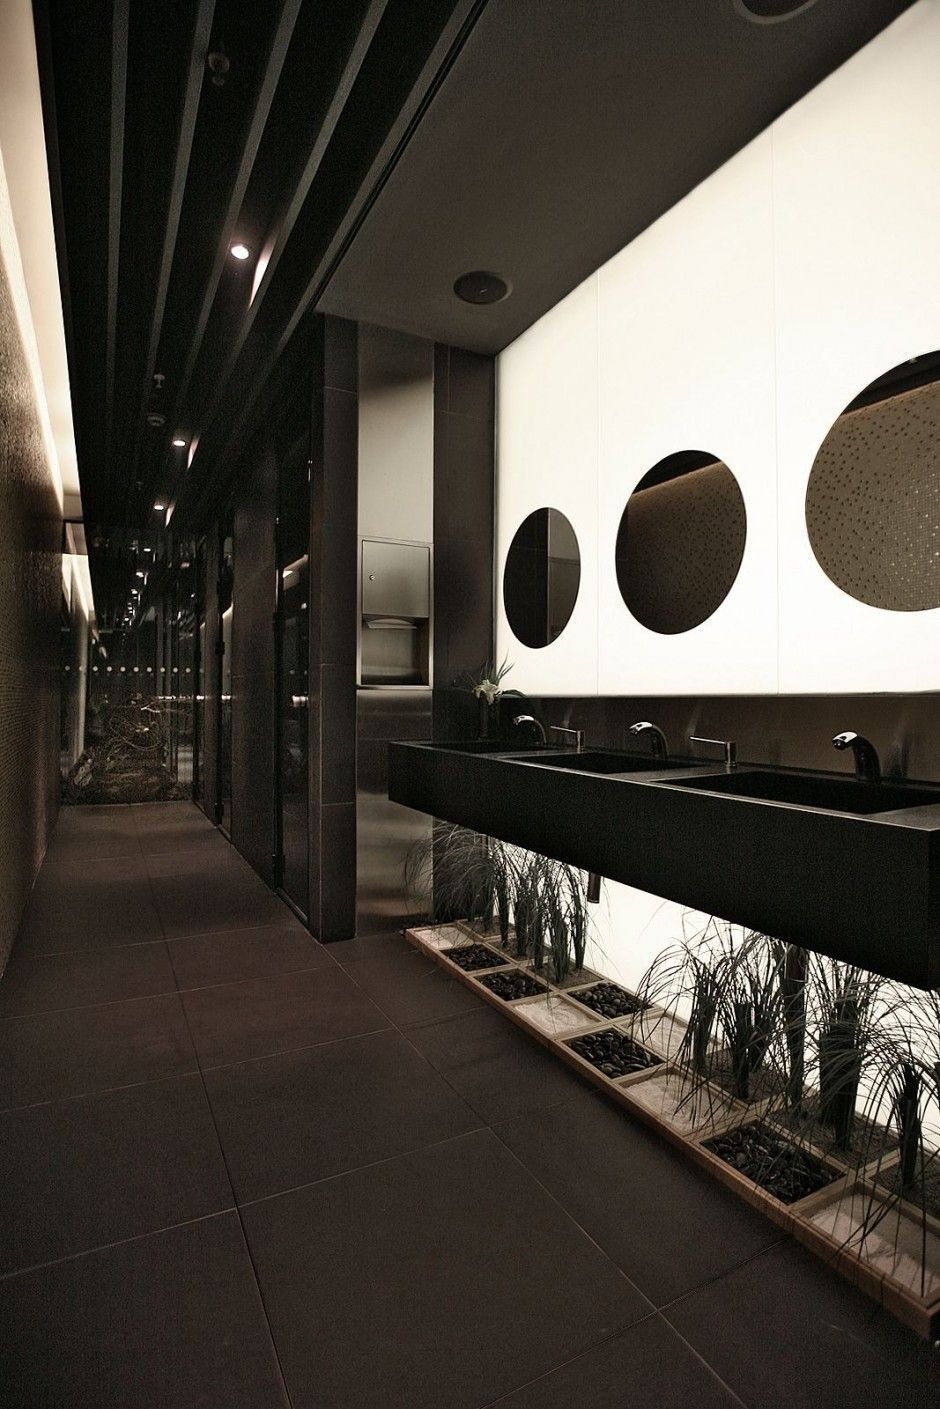 Radisson Hotel Lobby By Tanju Ozelginv